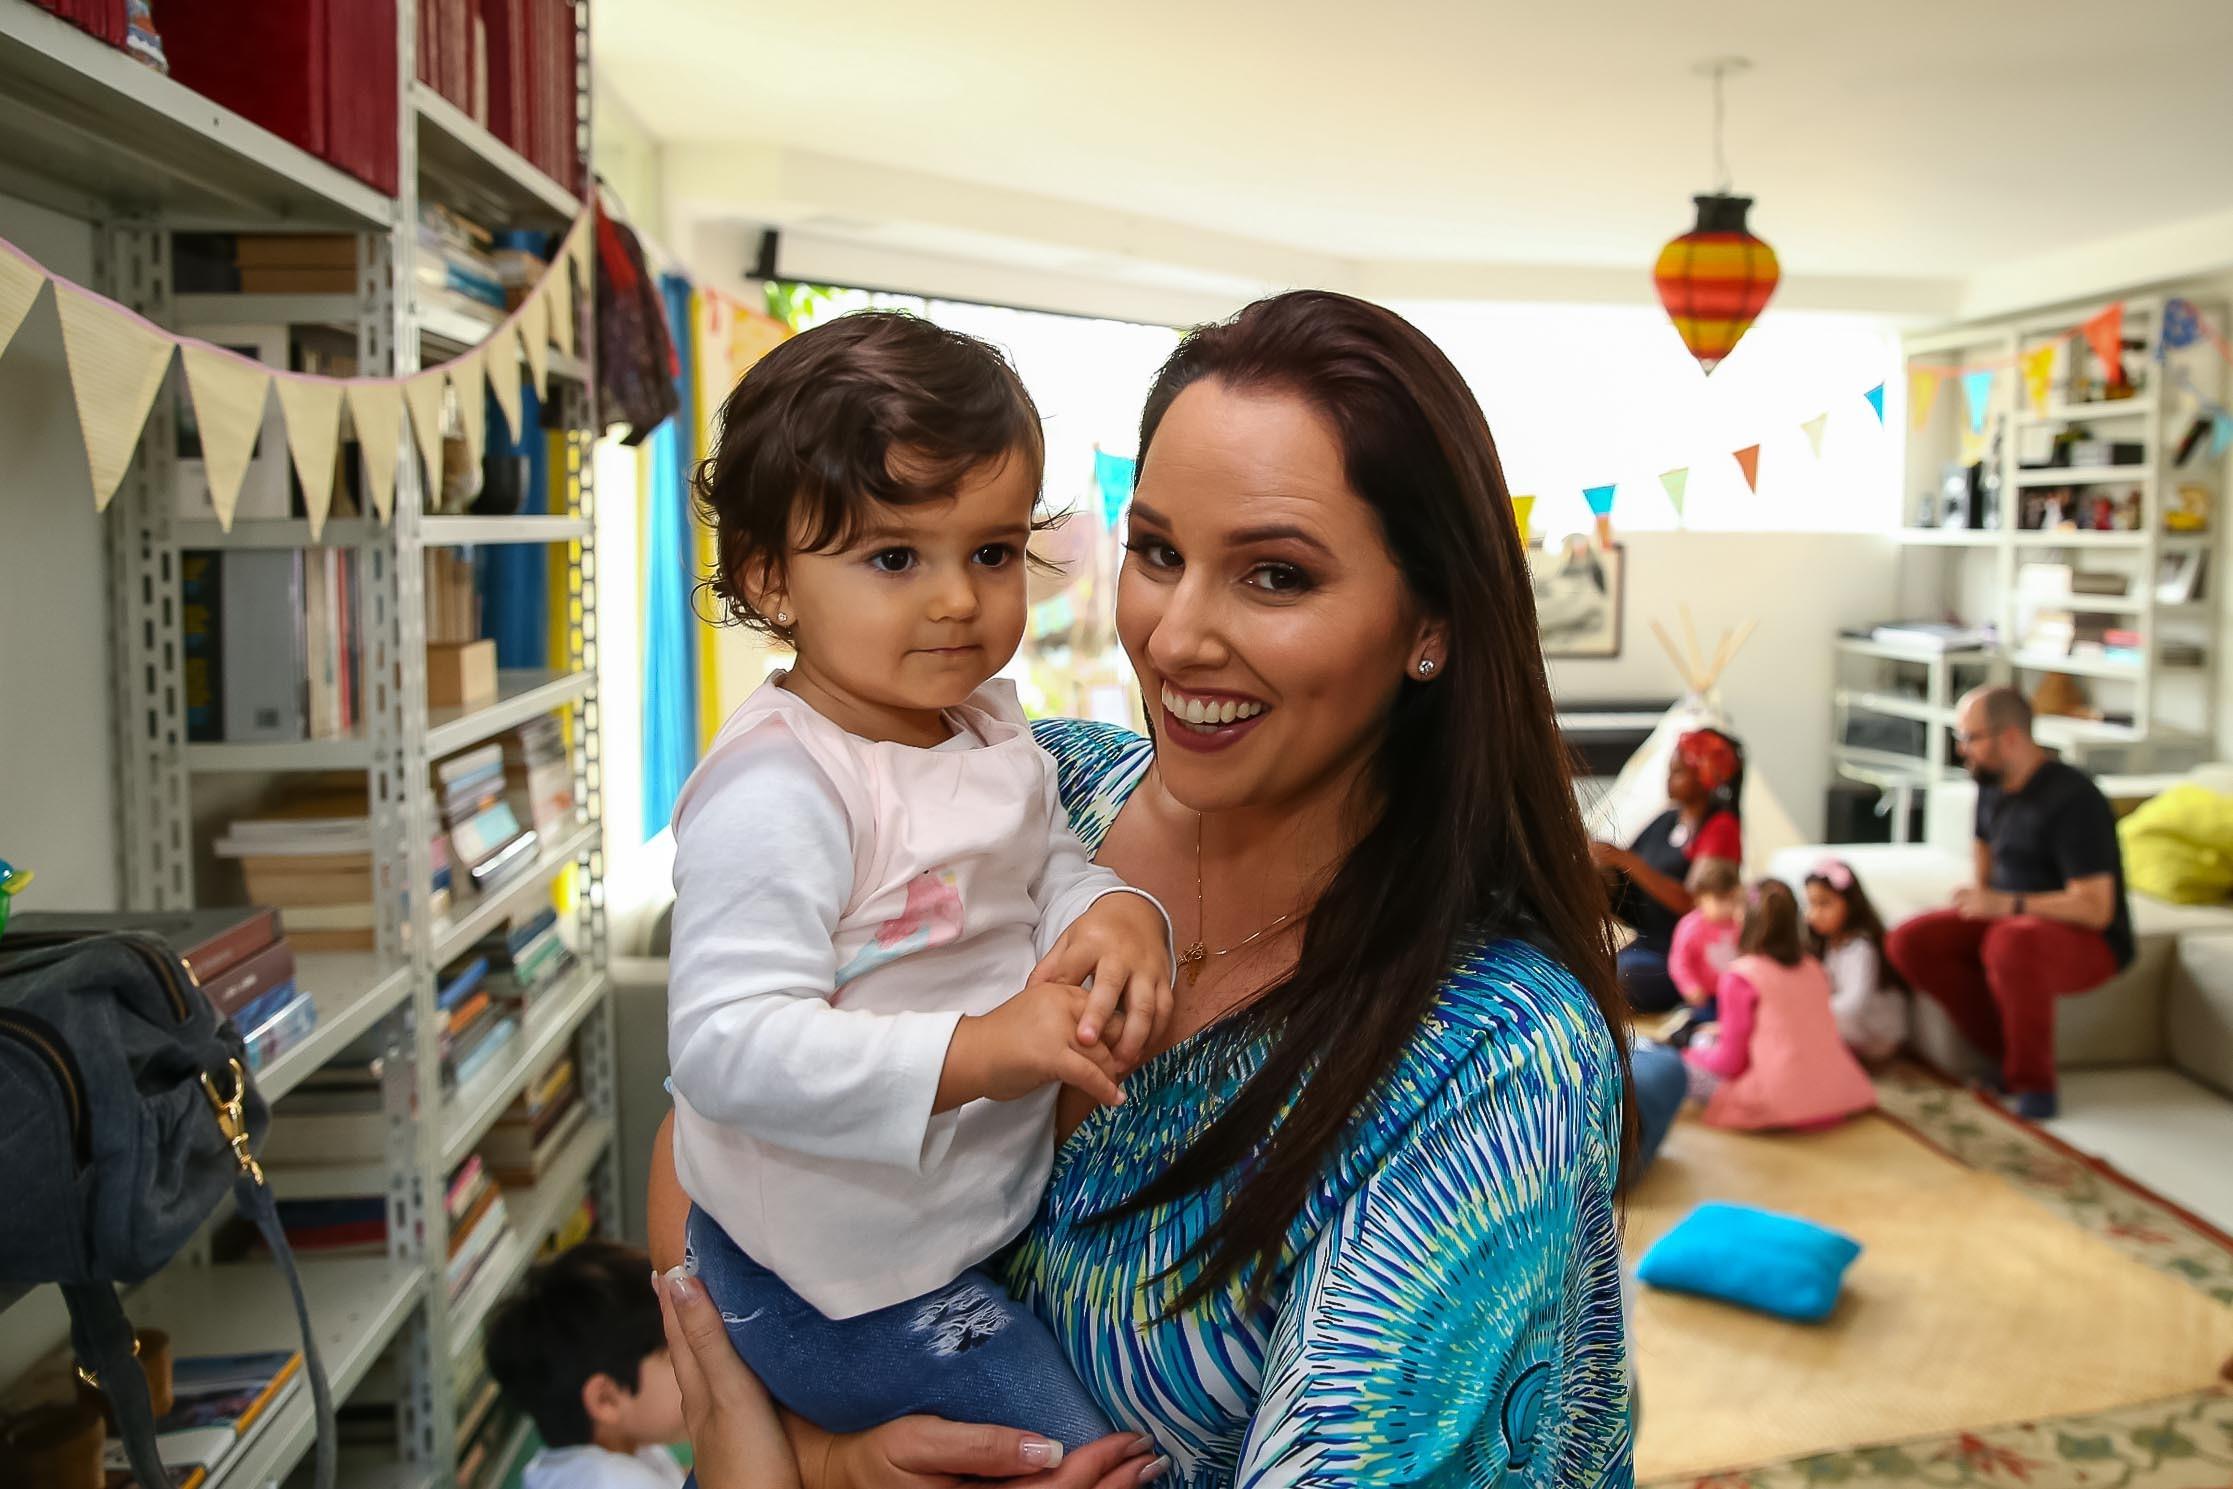 Mari Belém e sua filha Júlia, de 1 ano (Foto: Felipe Abe)